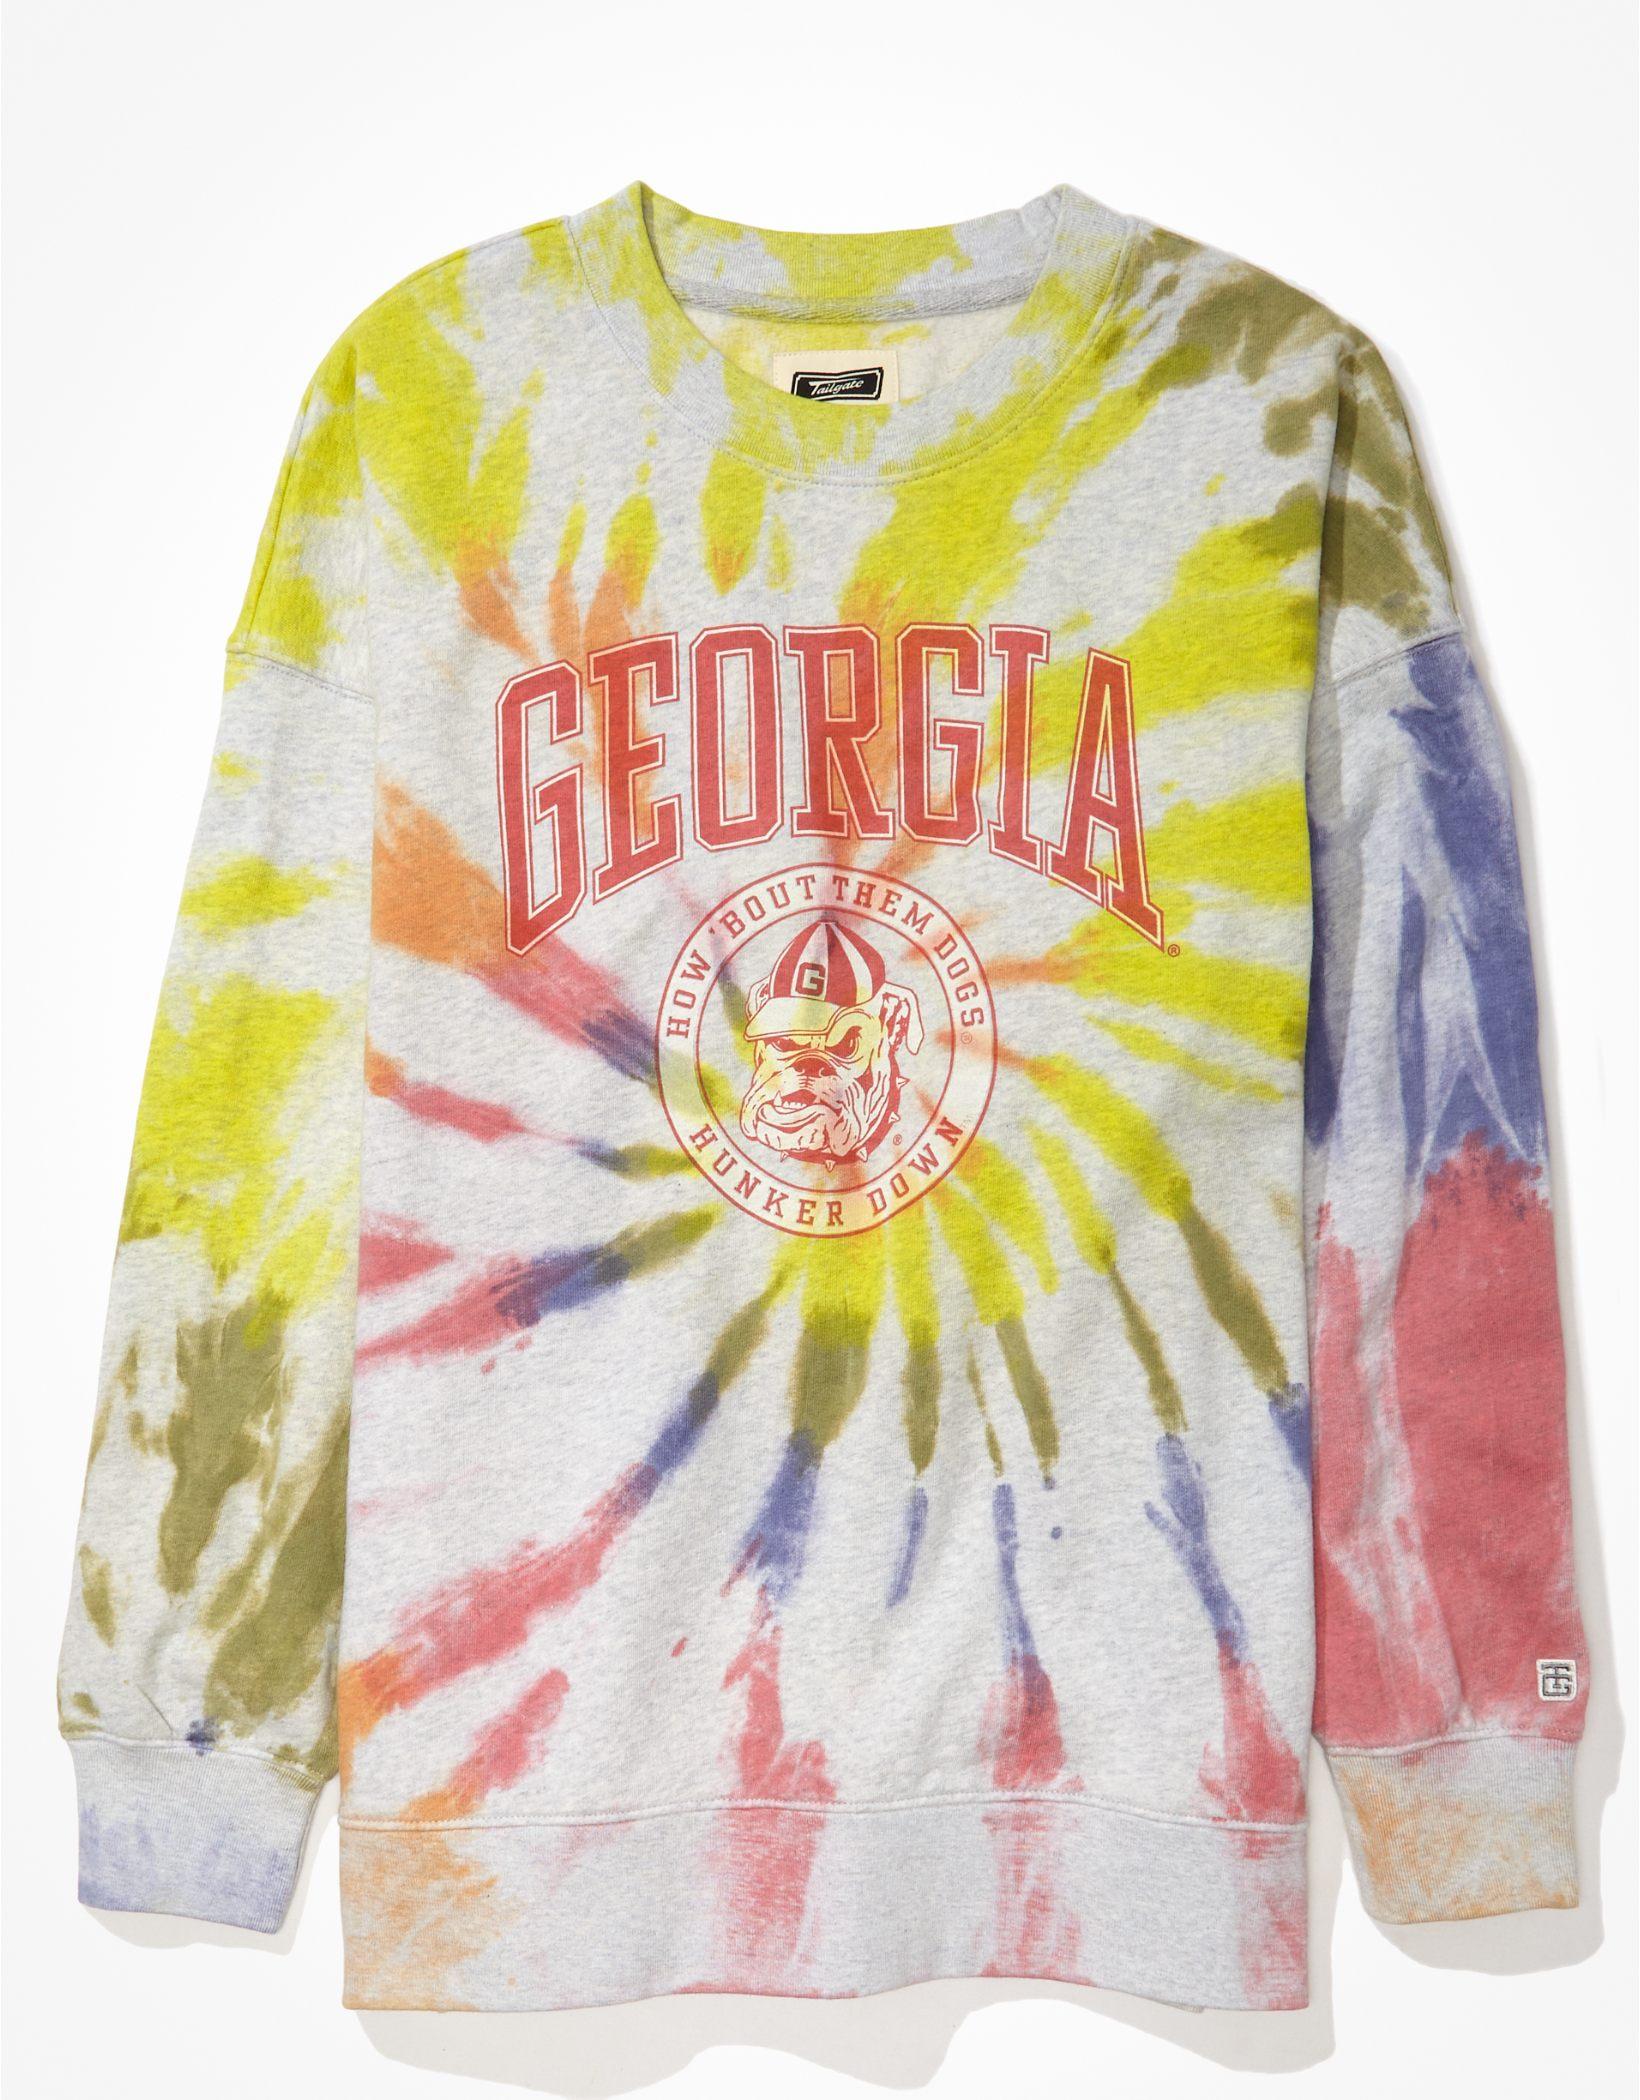 Tailgate Women's Georgia Bulldogs Oversized Tie-Dye Sweatshirt